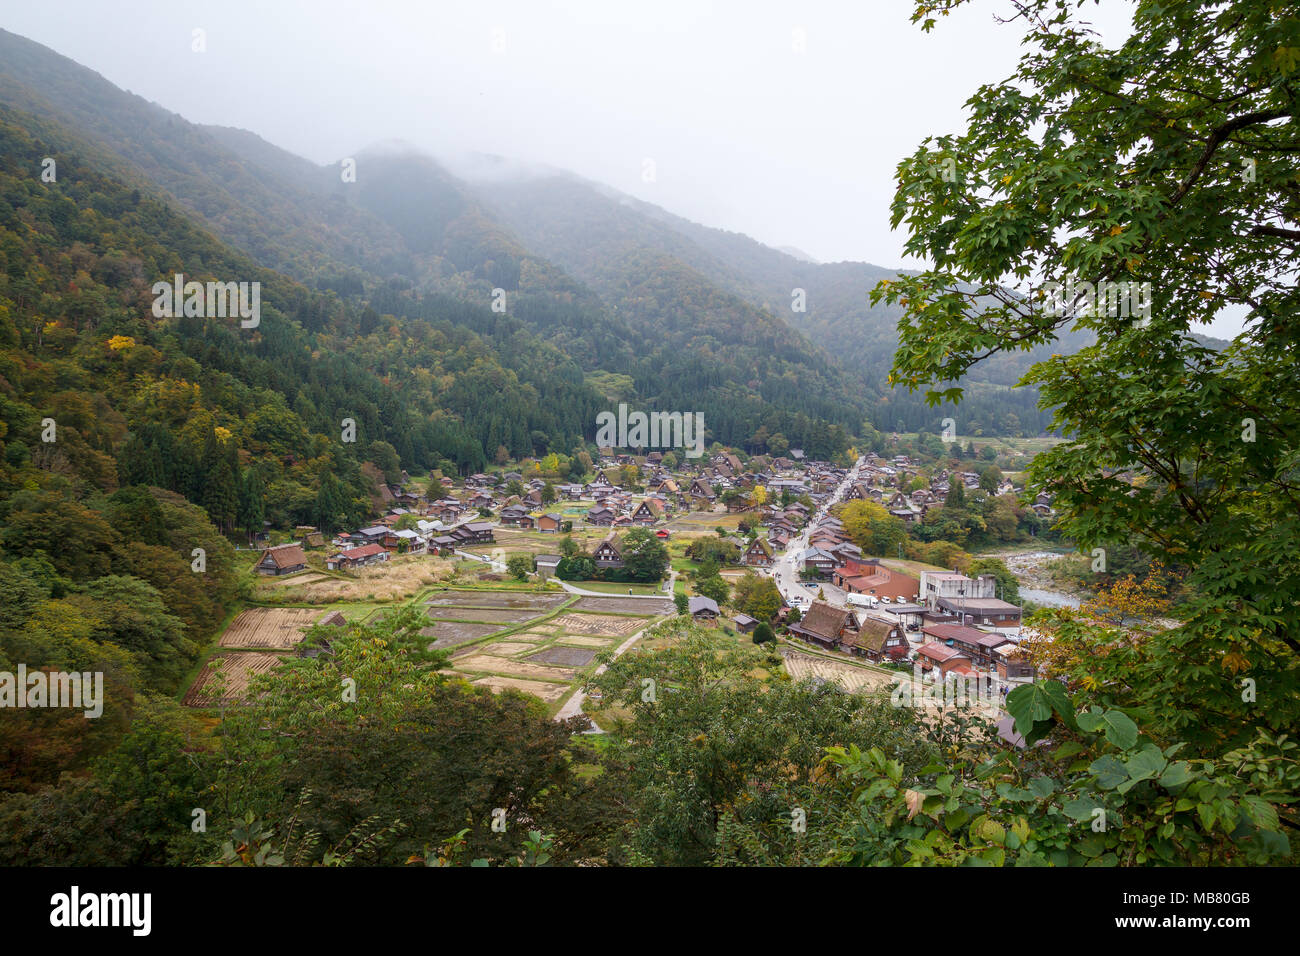 Shirakawa-go village in Gifu prefecture, Japan. It is one of UNESCO's World Heritage Sites. - Stock Image